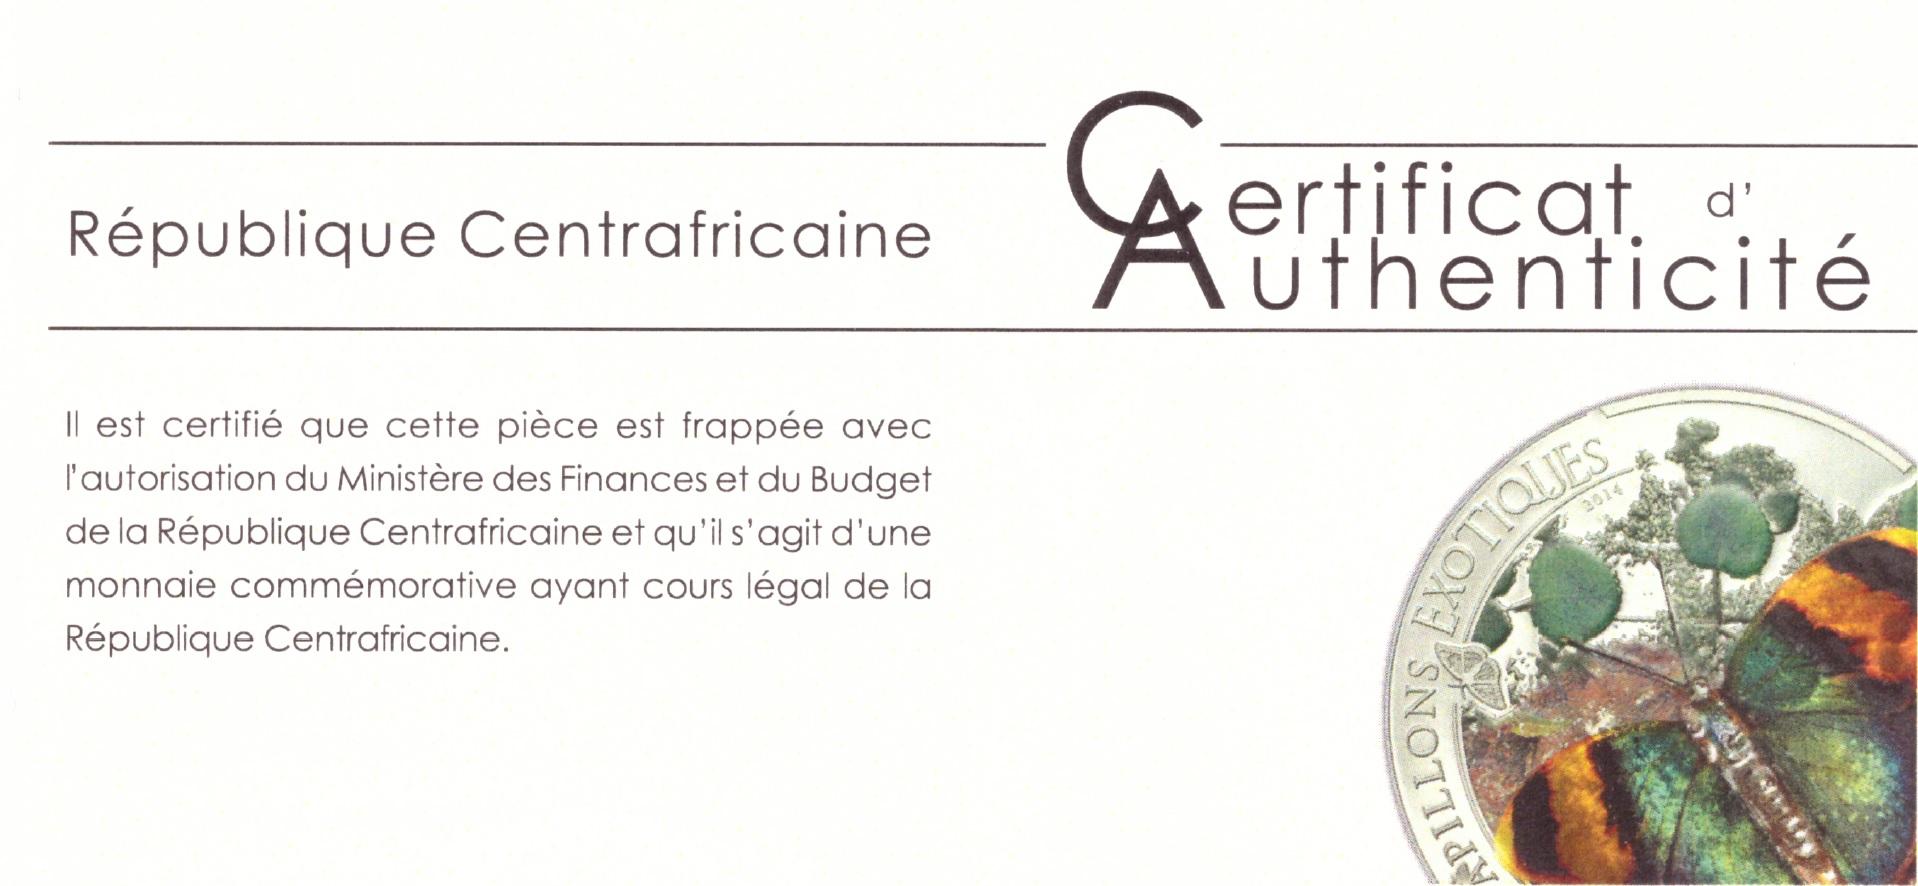 1000 Francs Cfa Erflies Of The